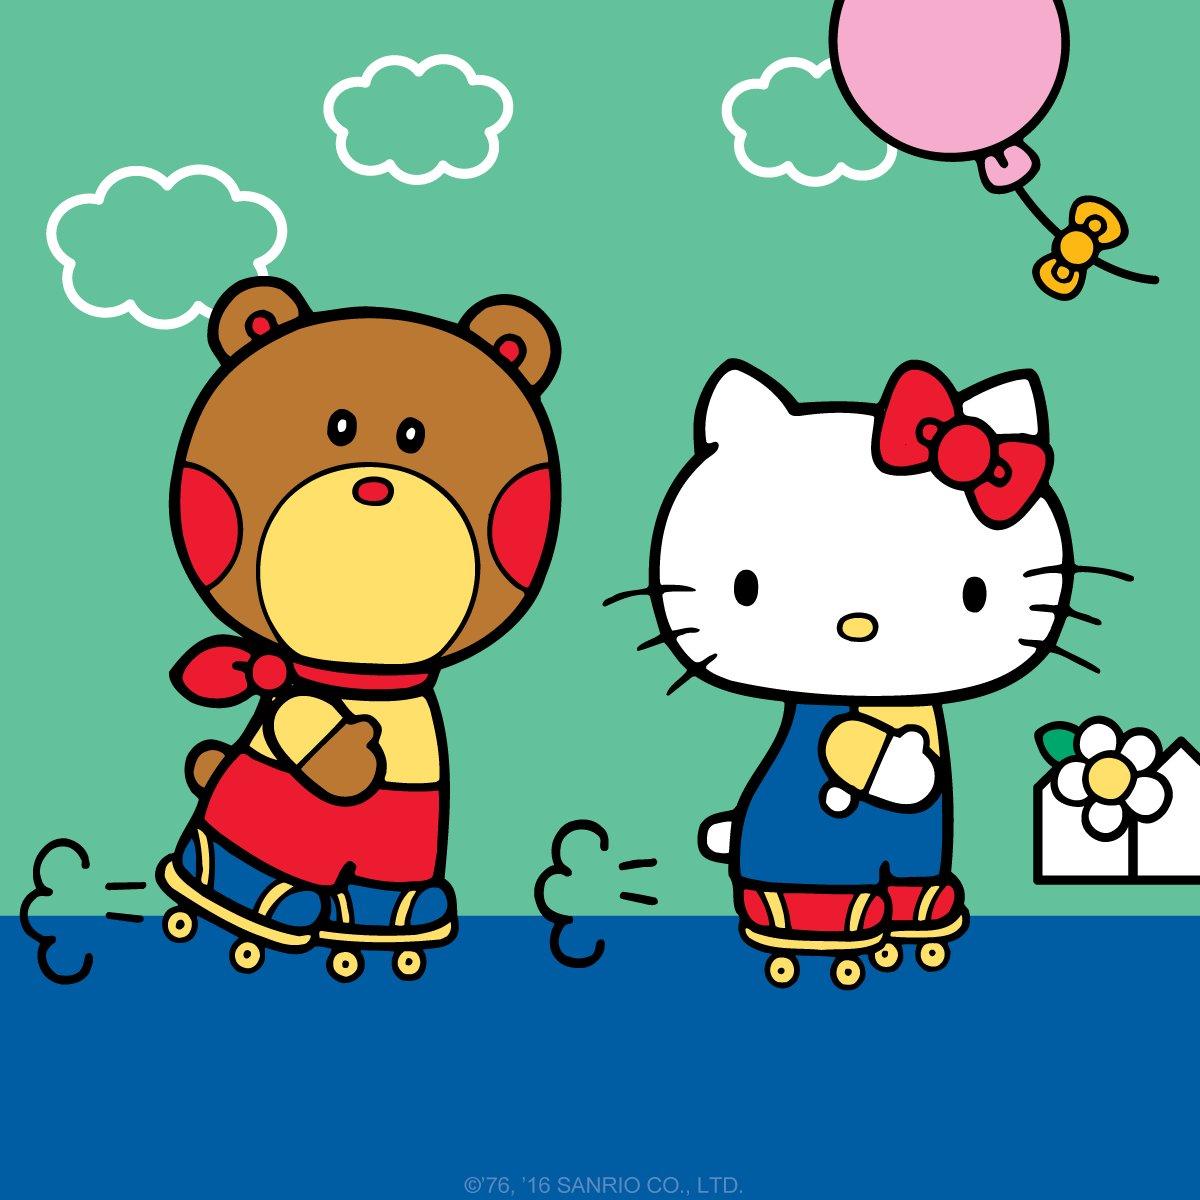 Hello kitty on twitter happy friendshipday everybody as hellokitty always says you can - Hello kitty hello ...